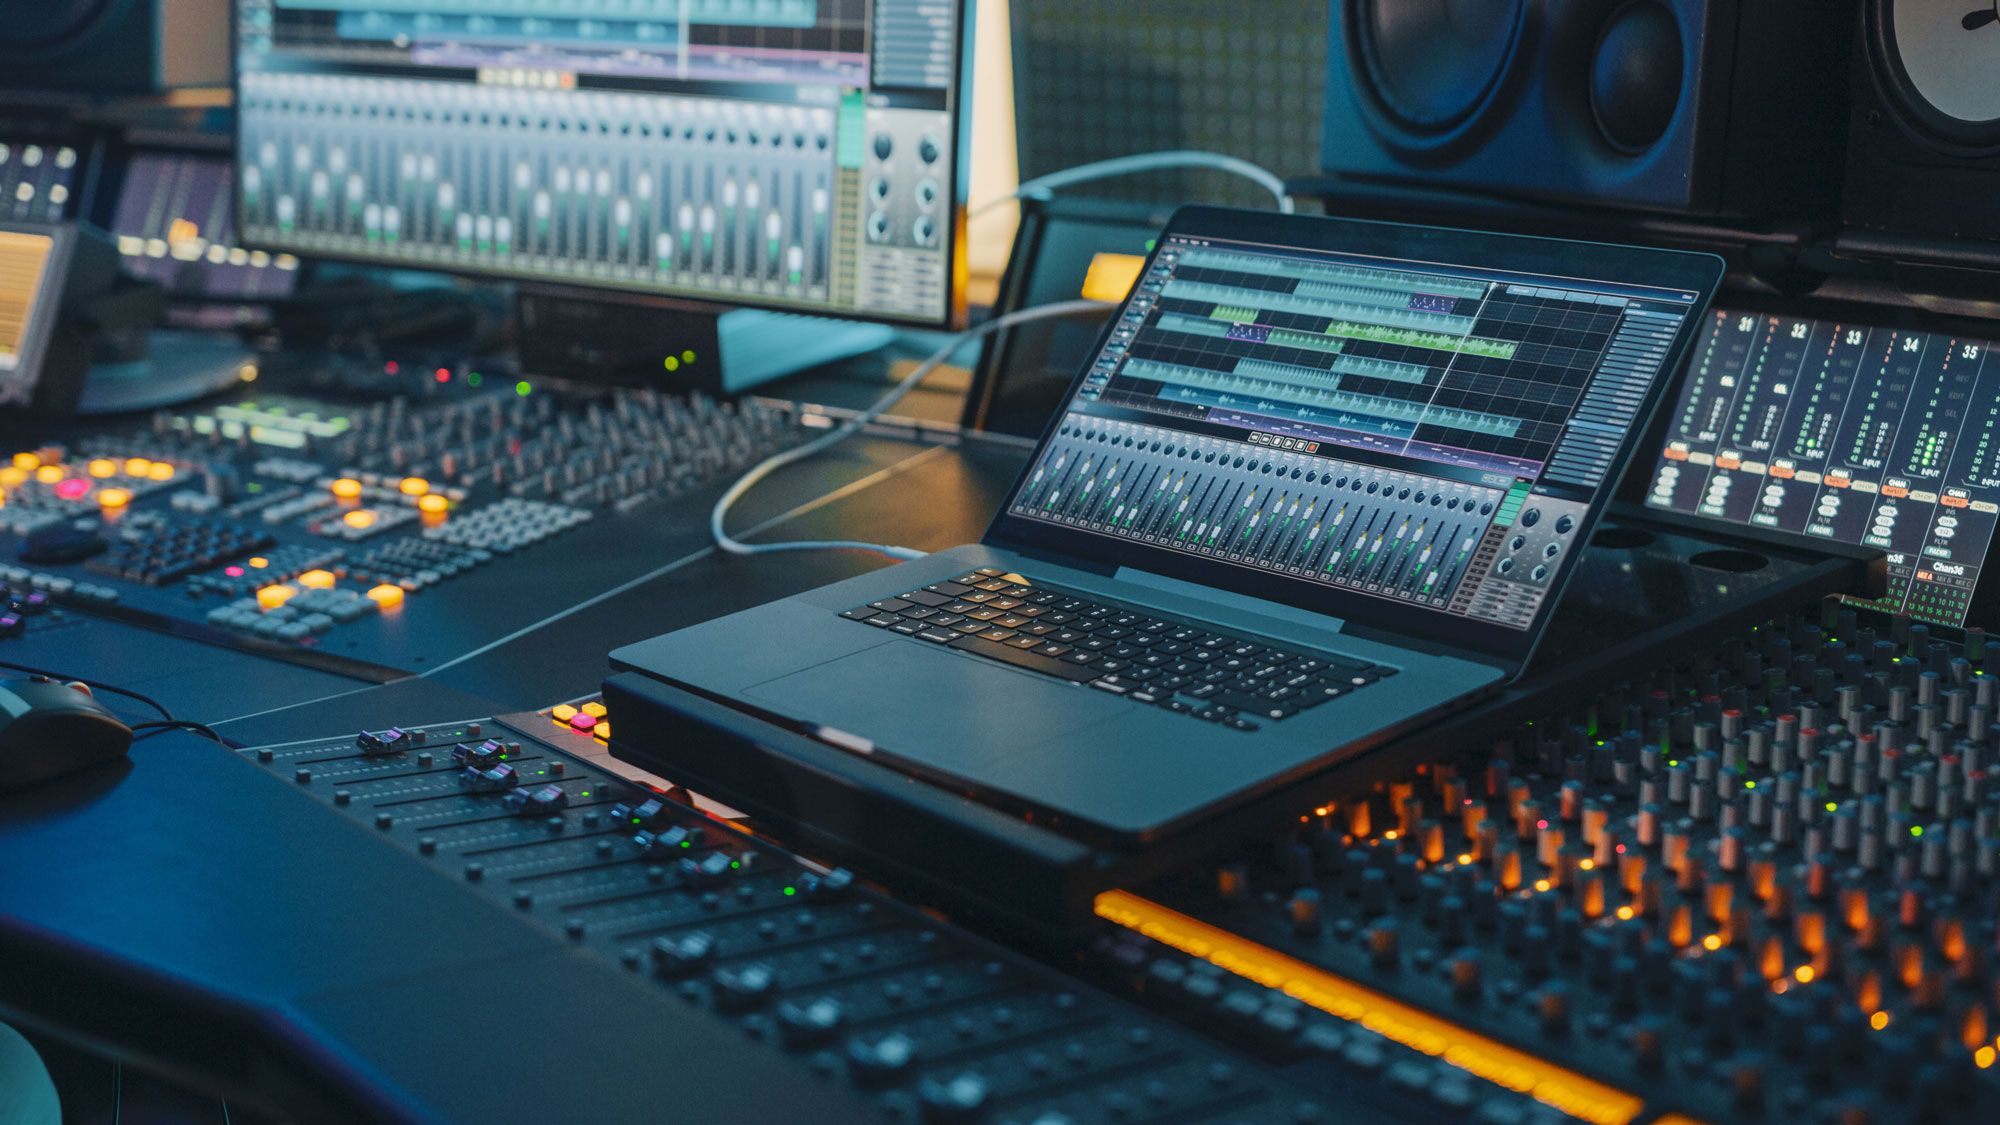 kopfmedia-werbeagentur-offenburg-sound-audio-ton-laptop